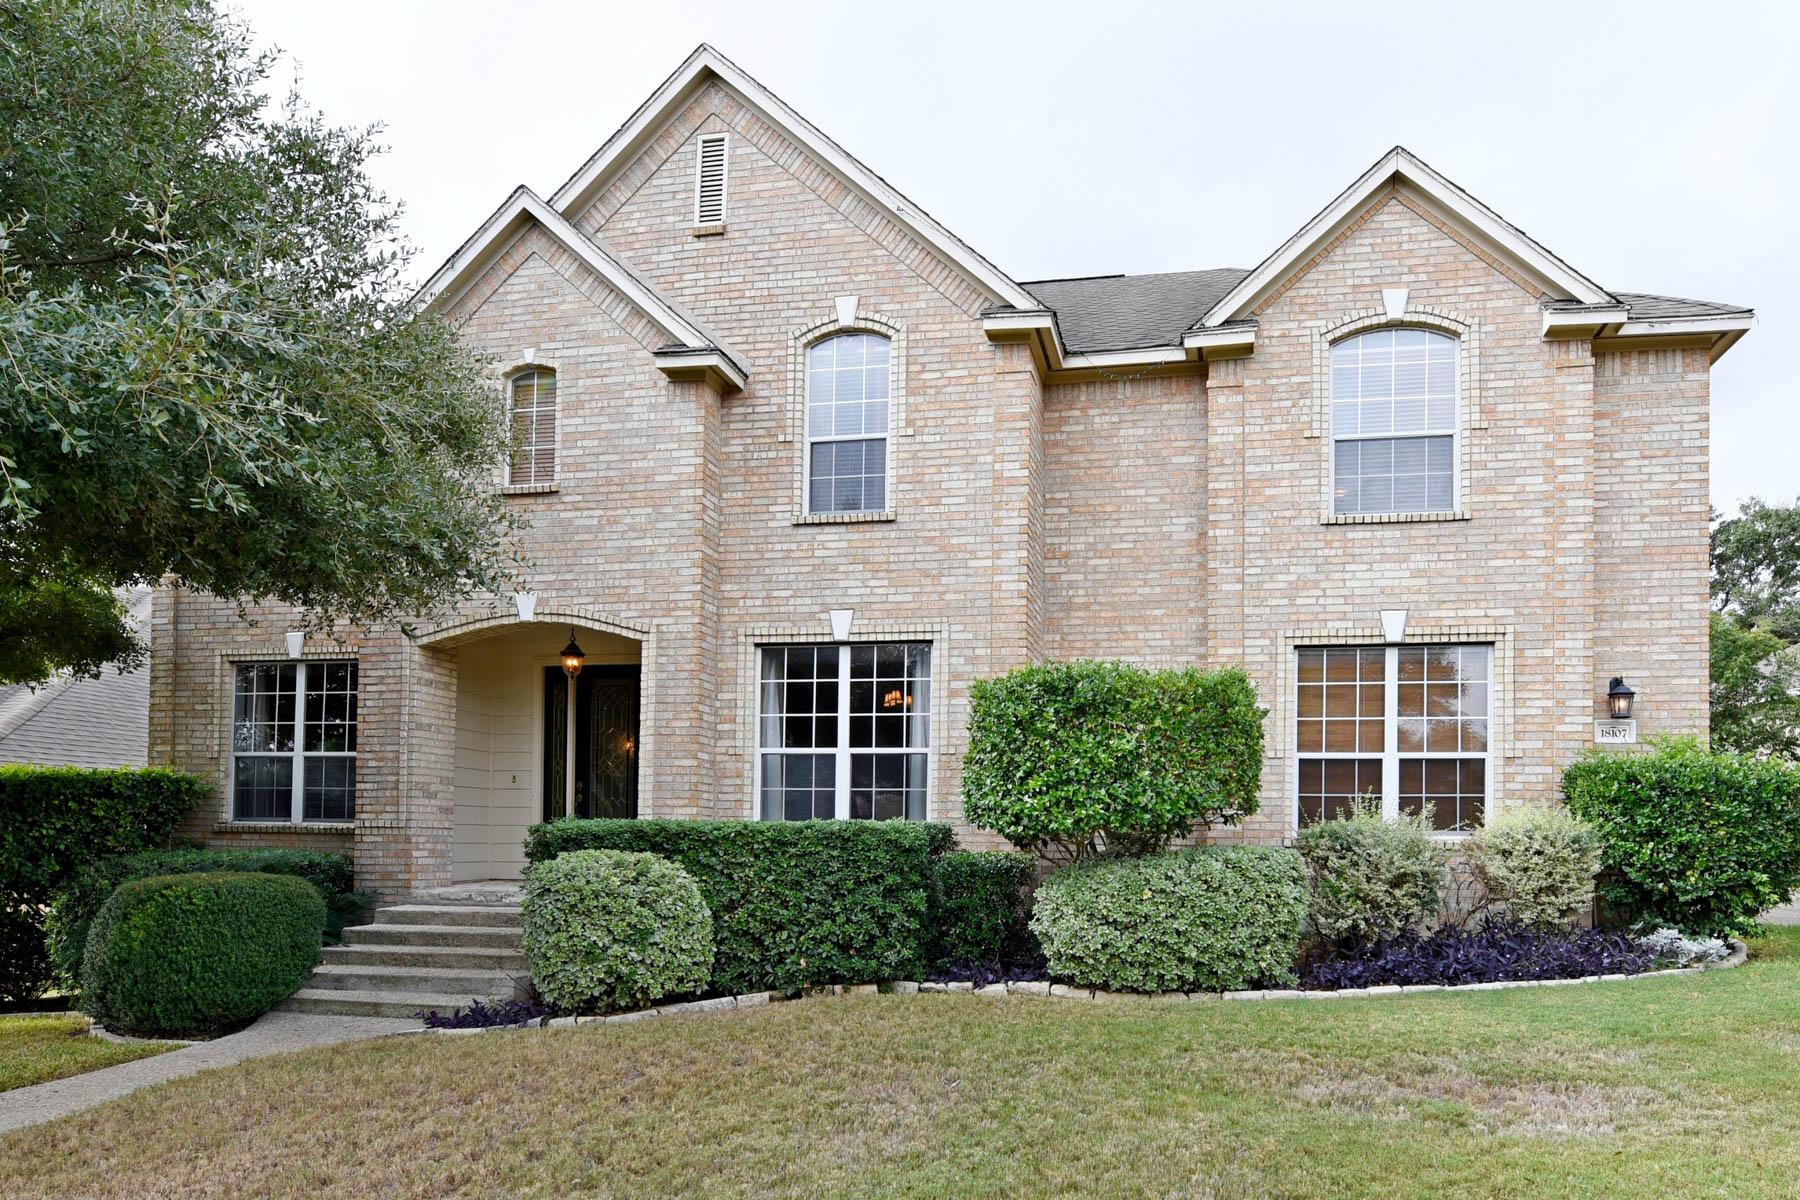 Single Family Home for Sale at Stunning Home in the Prestigious North Stone Oak 18107 Keystone Bluff San Antonio, Texas 78258 United States